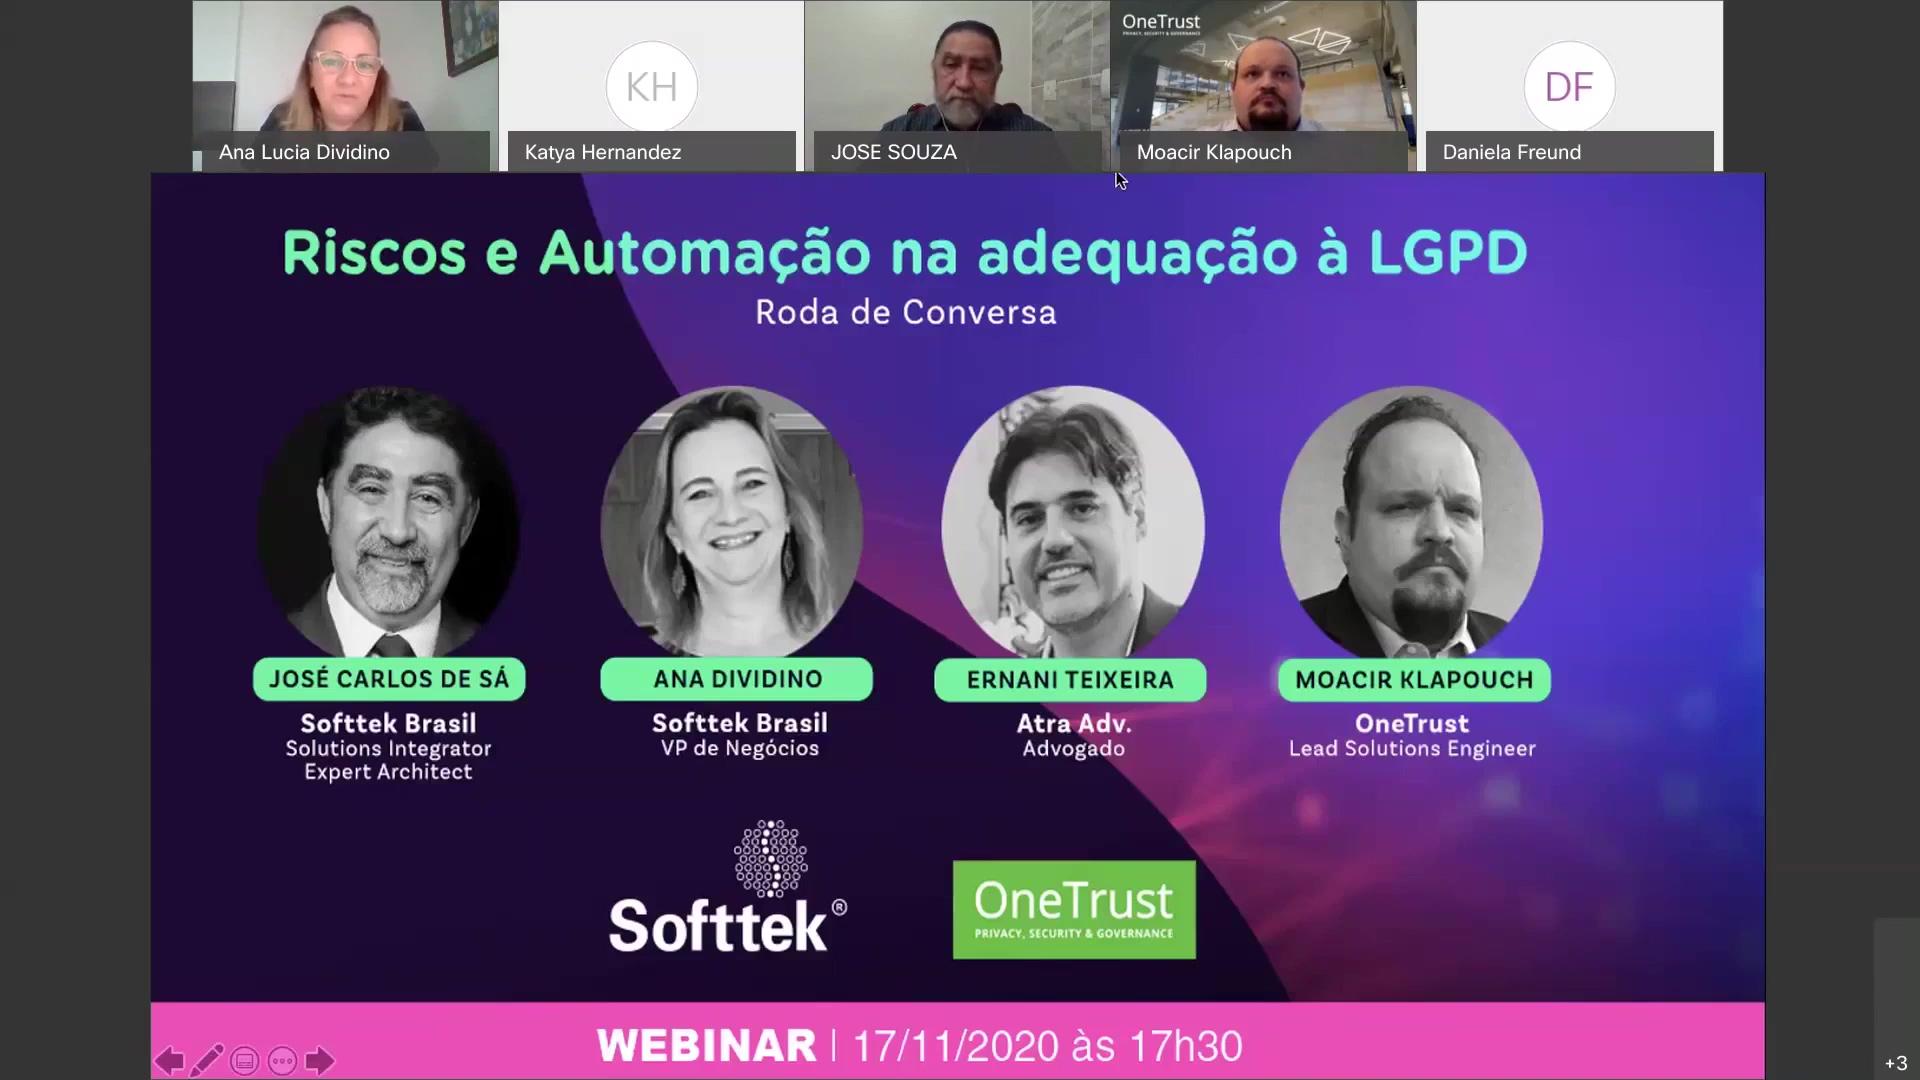 Softtek-Webinar-Riscos-e-Automacao-na-adequacao-a-LGPD